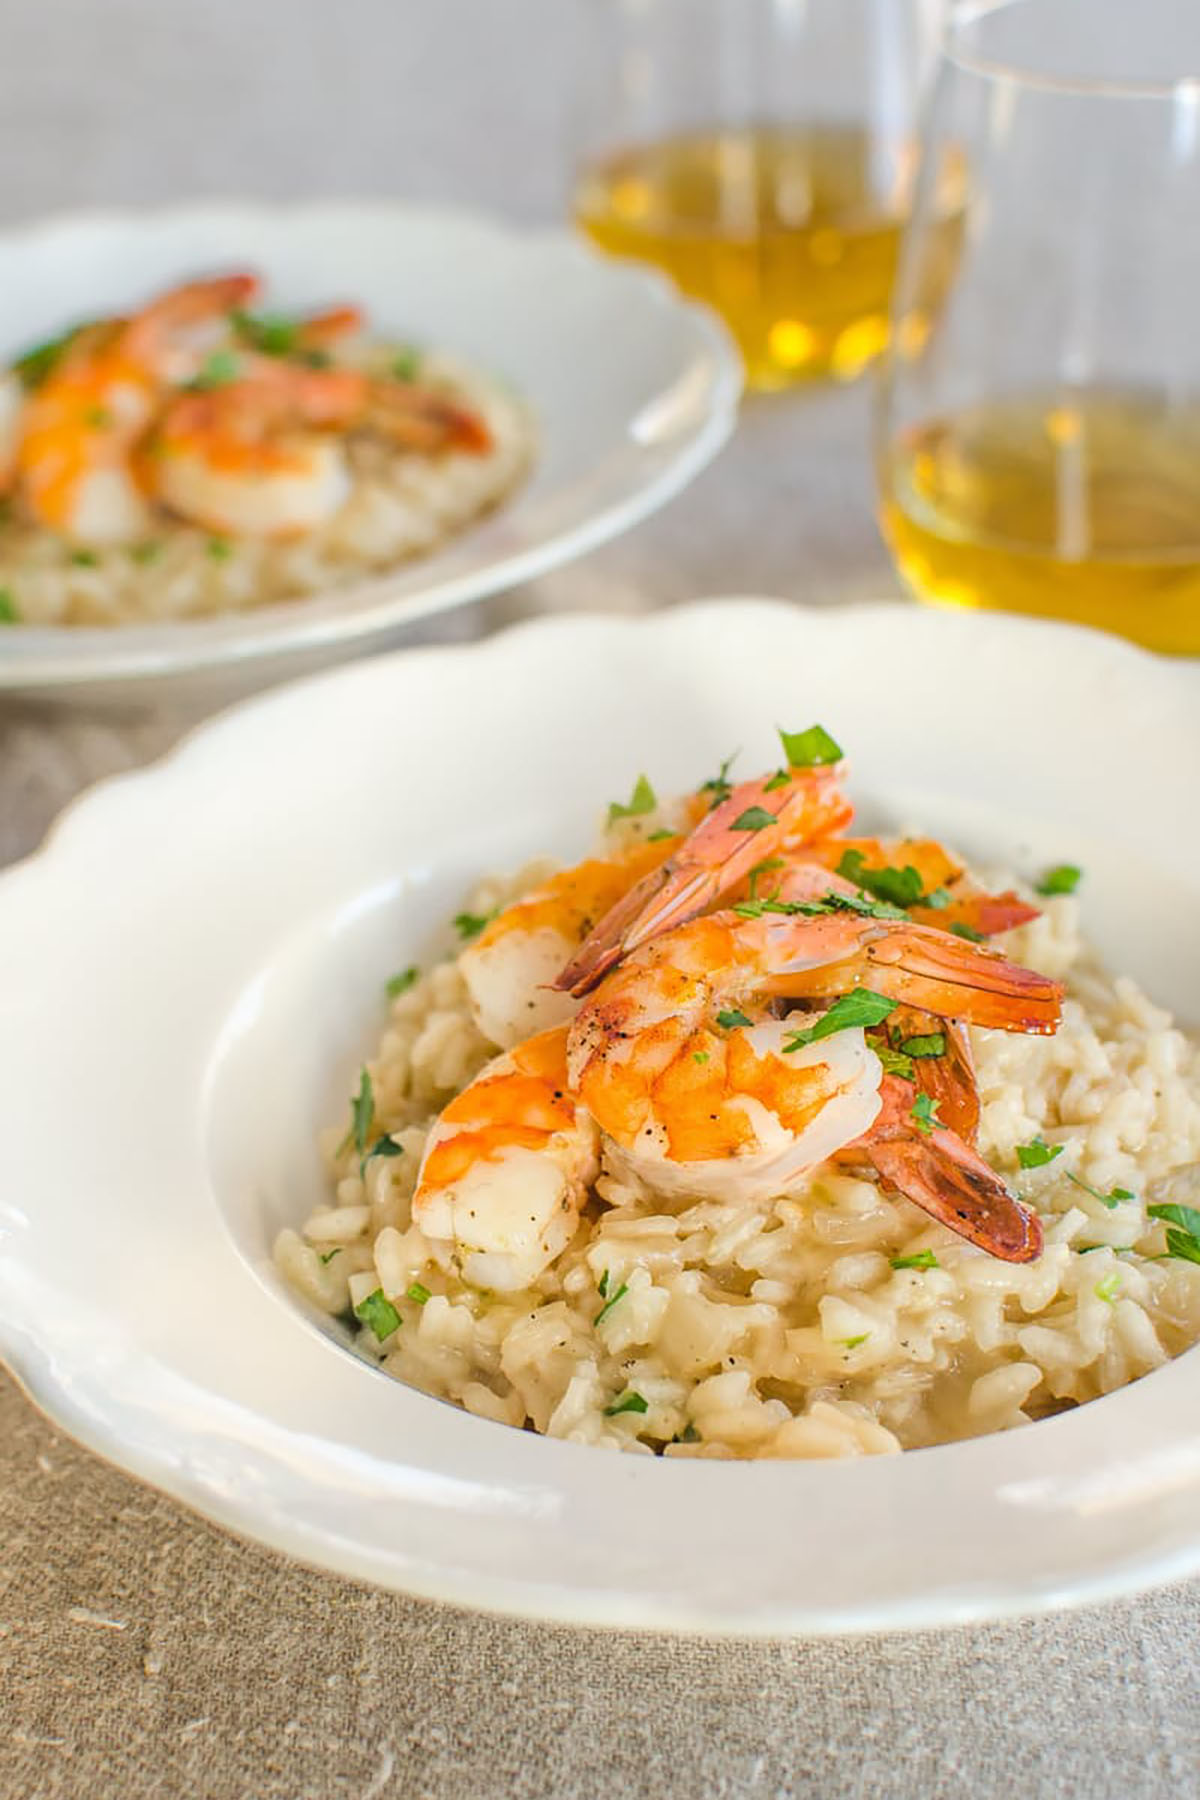 easy romantic dinner ideas for two chicken crockpot recipes dinner